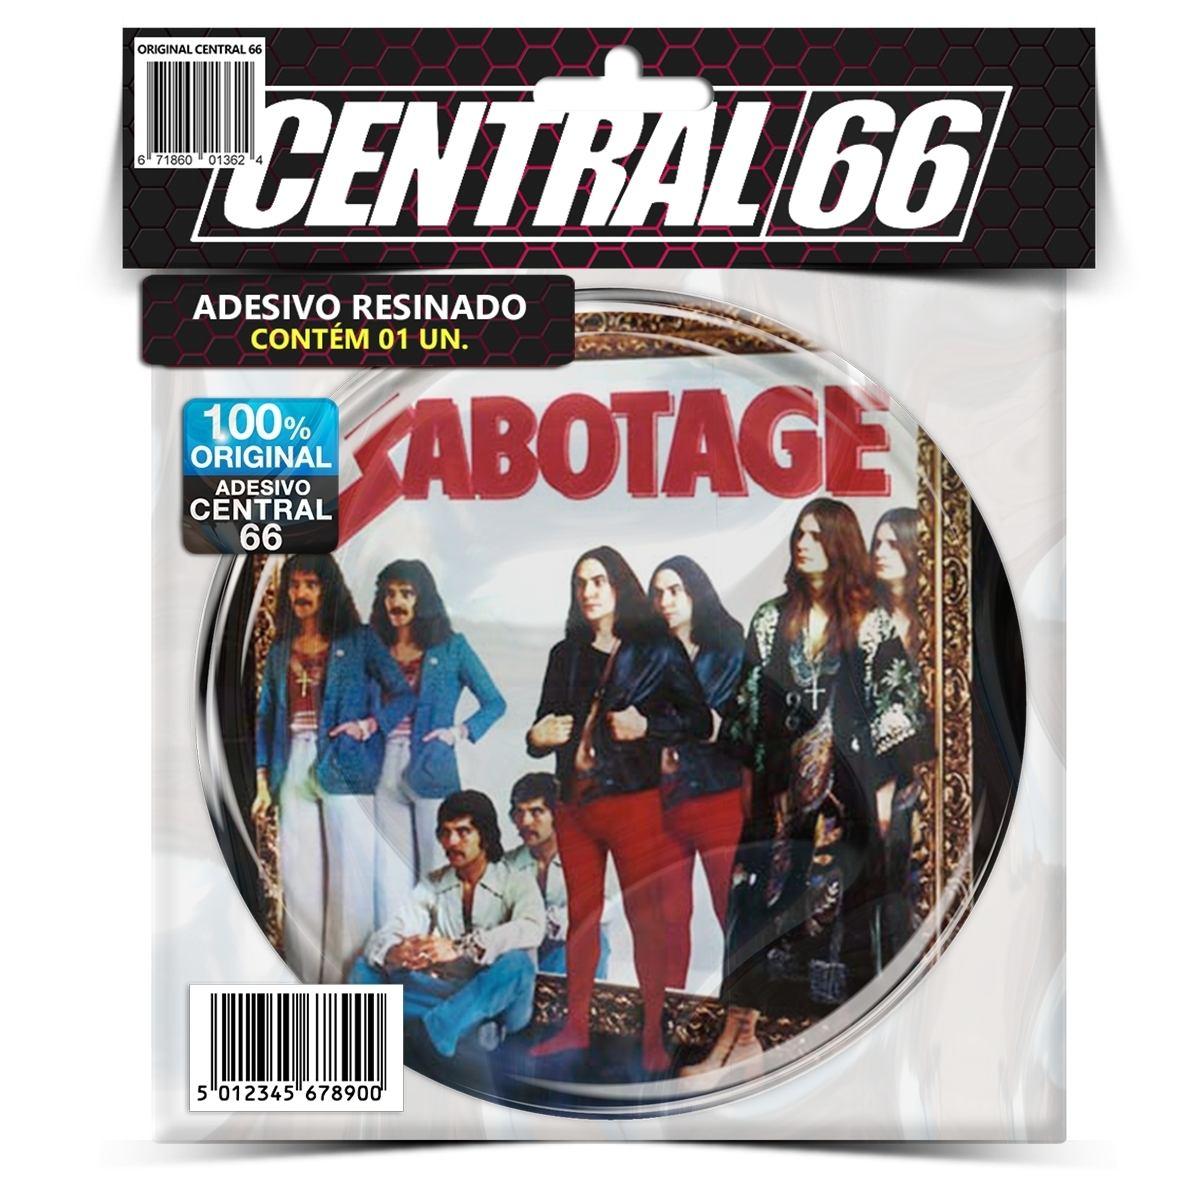 Adesivo Redondo Black Sabbath Sabotage – Central 66